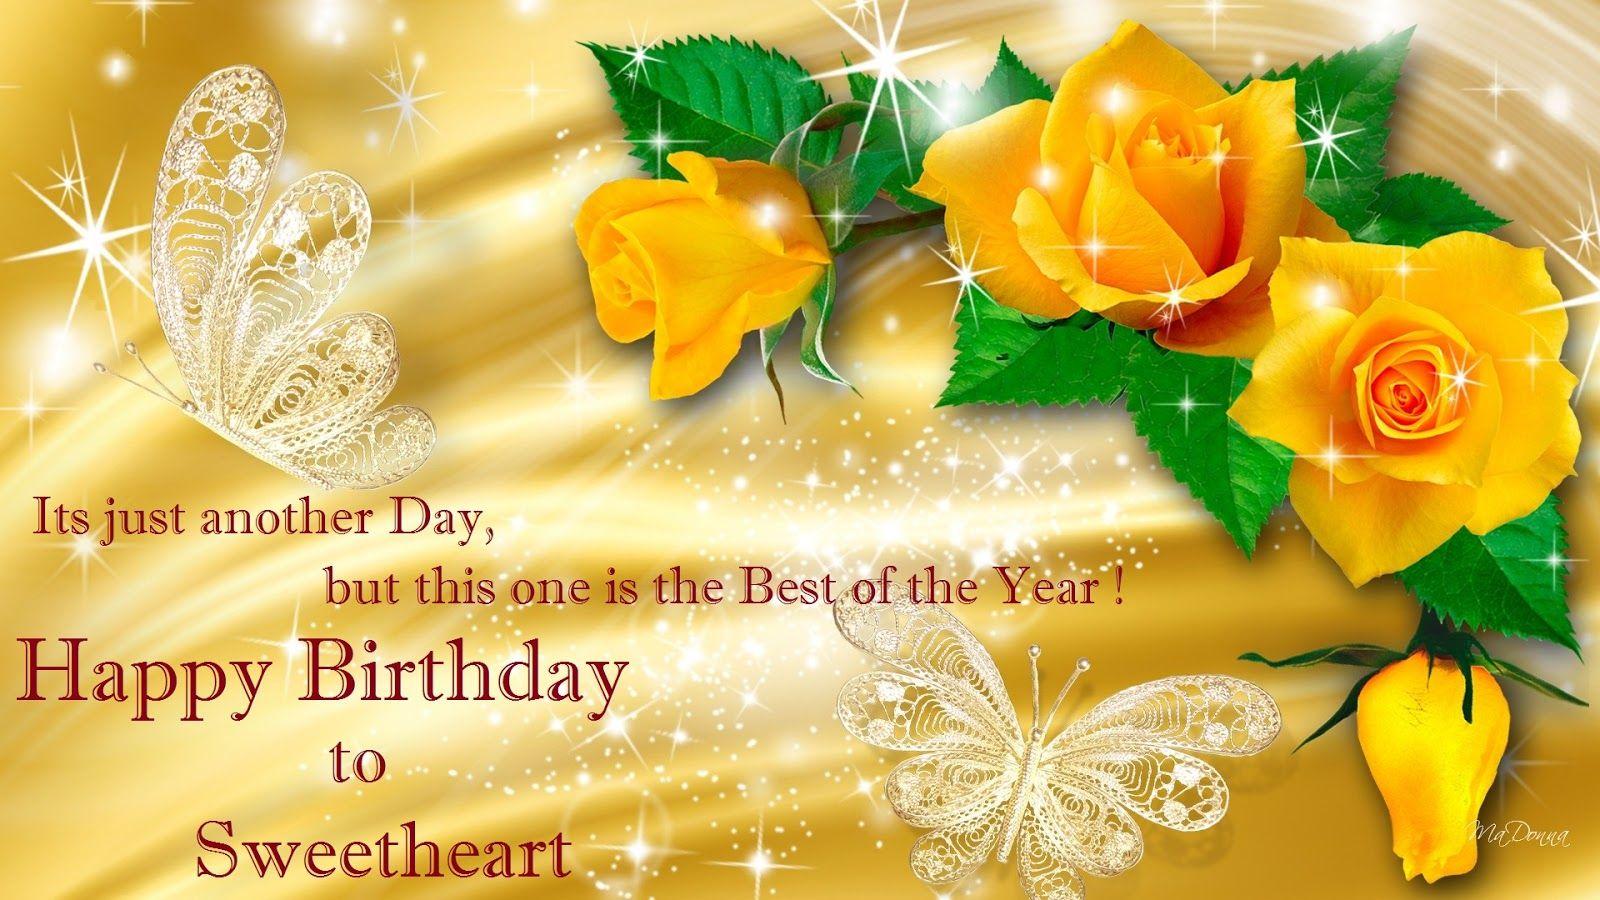 Superb Happy Birthday Wishes Birthday Wishes And Birthday Wishes For Valentine Love Quotes Grandhistoriesus